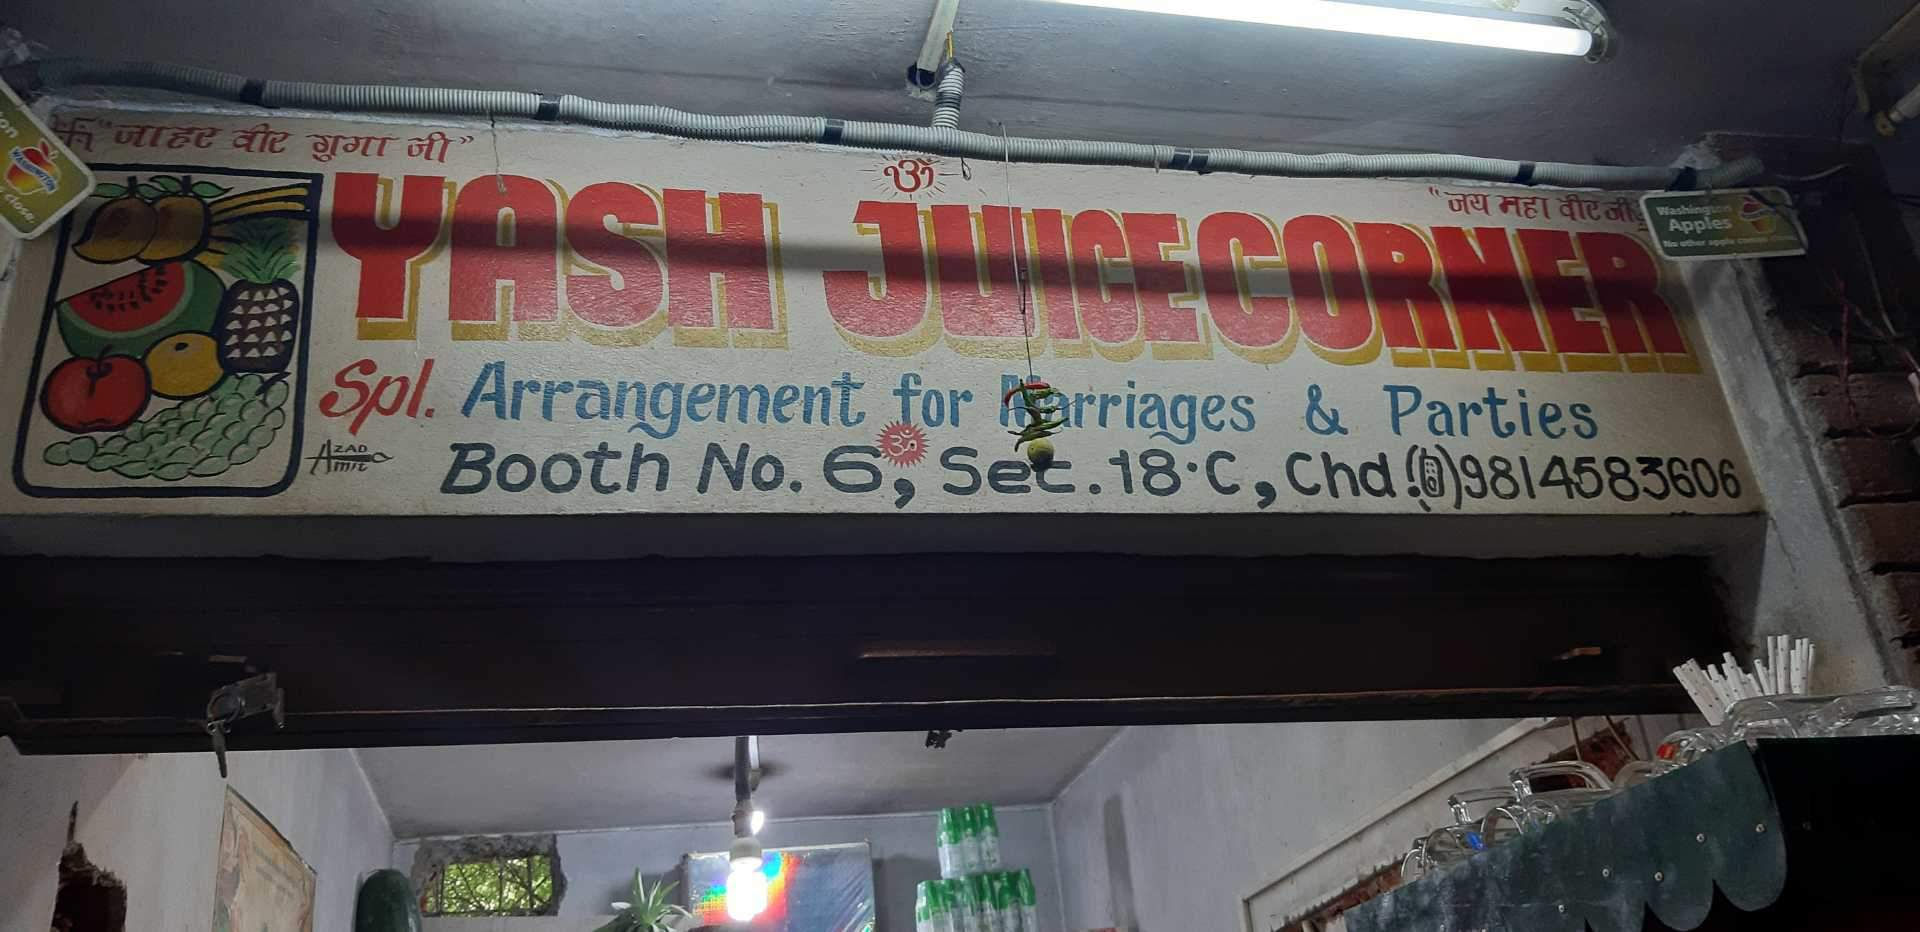 Yash Fruit Shop & Juice Corner - Sector 18 - Chandigarh Image